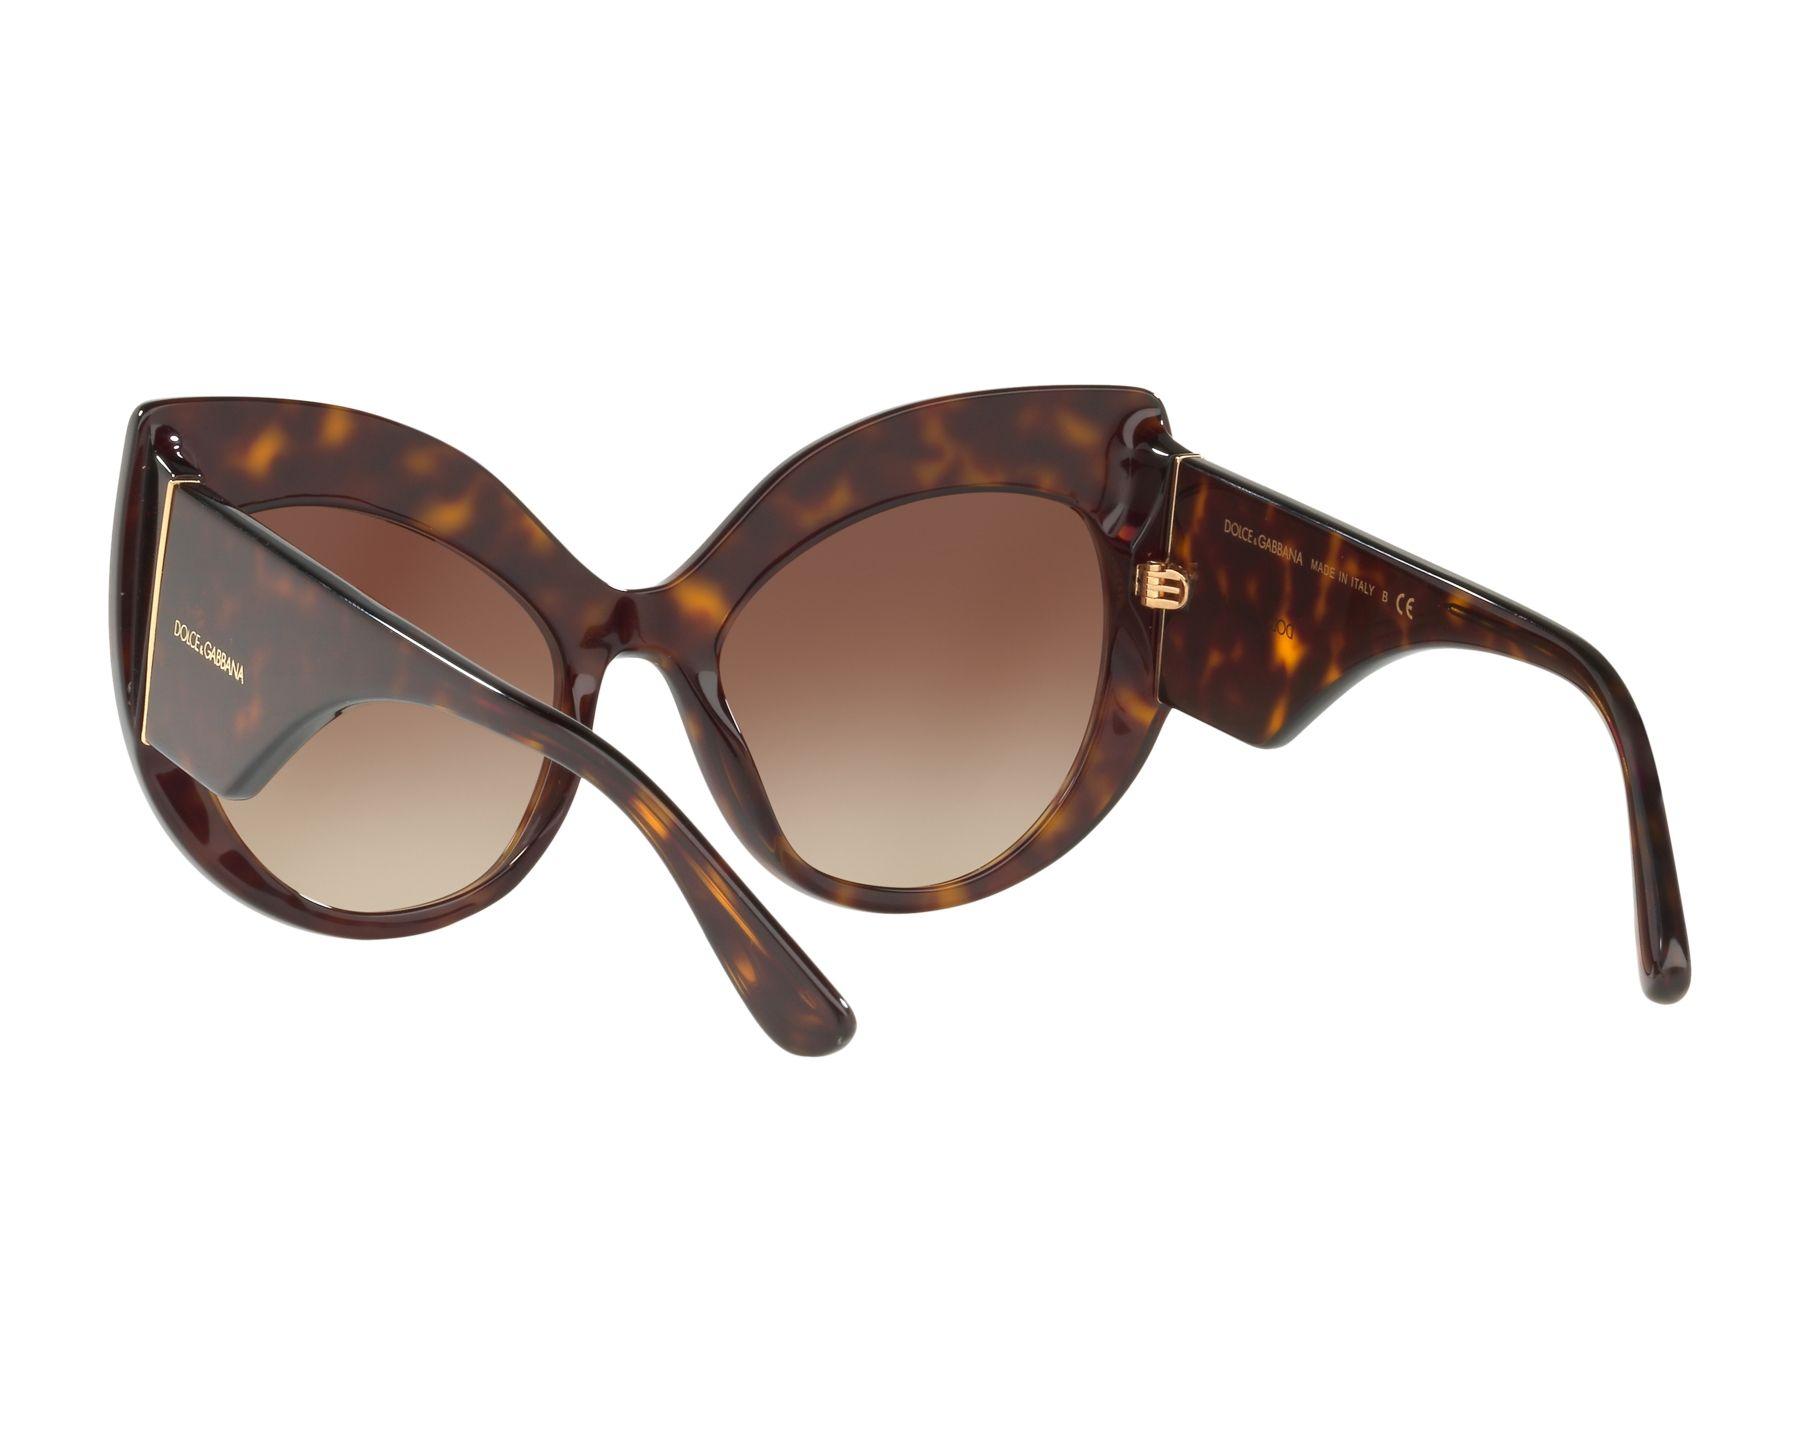 DOLCE & GABBANA Dolce & Gabbana Damen Sonnenbrille » DG4321«, braun, 502/13 - braun/braun